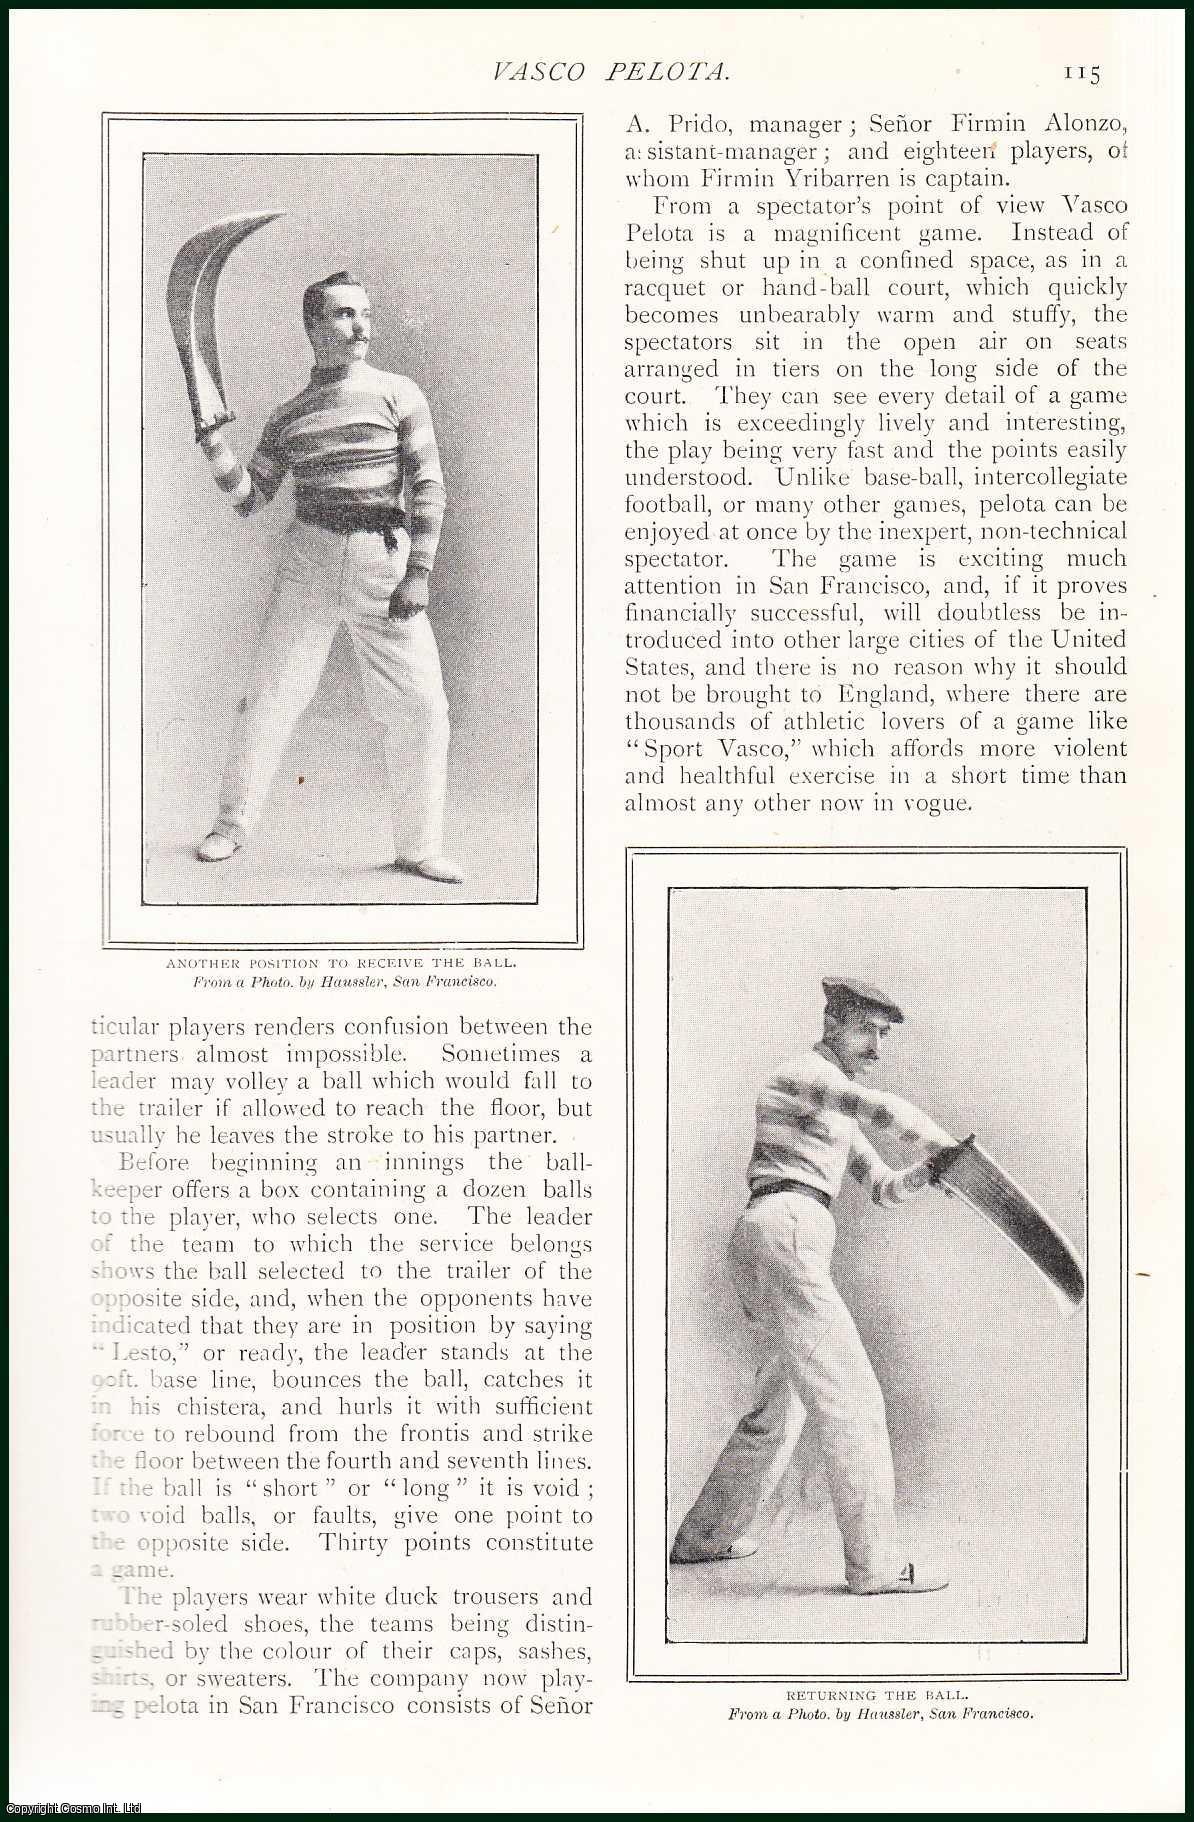 INKERSLEY, ARTHUR - Vasco Pelota or Basque Ball. An original article from The Strand Magazine, 1902.